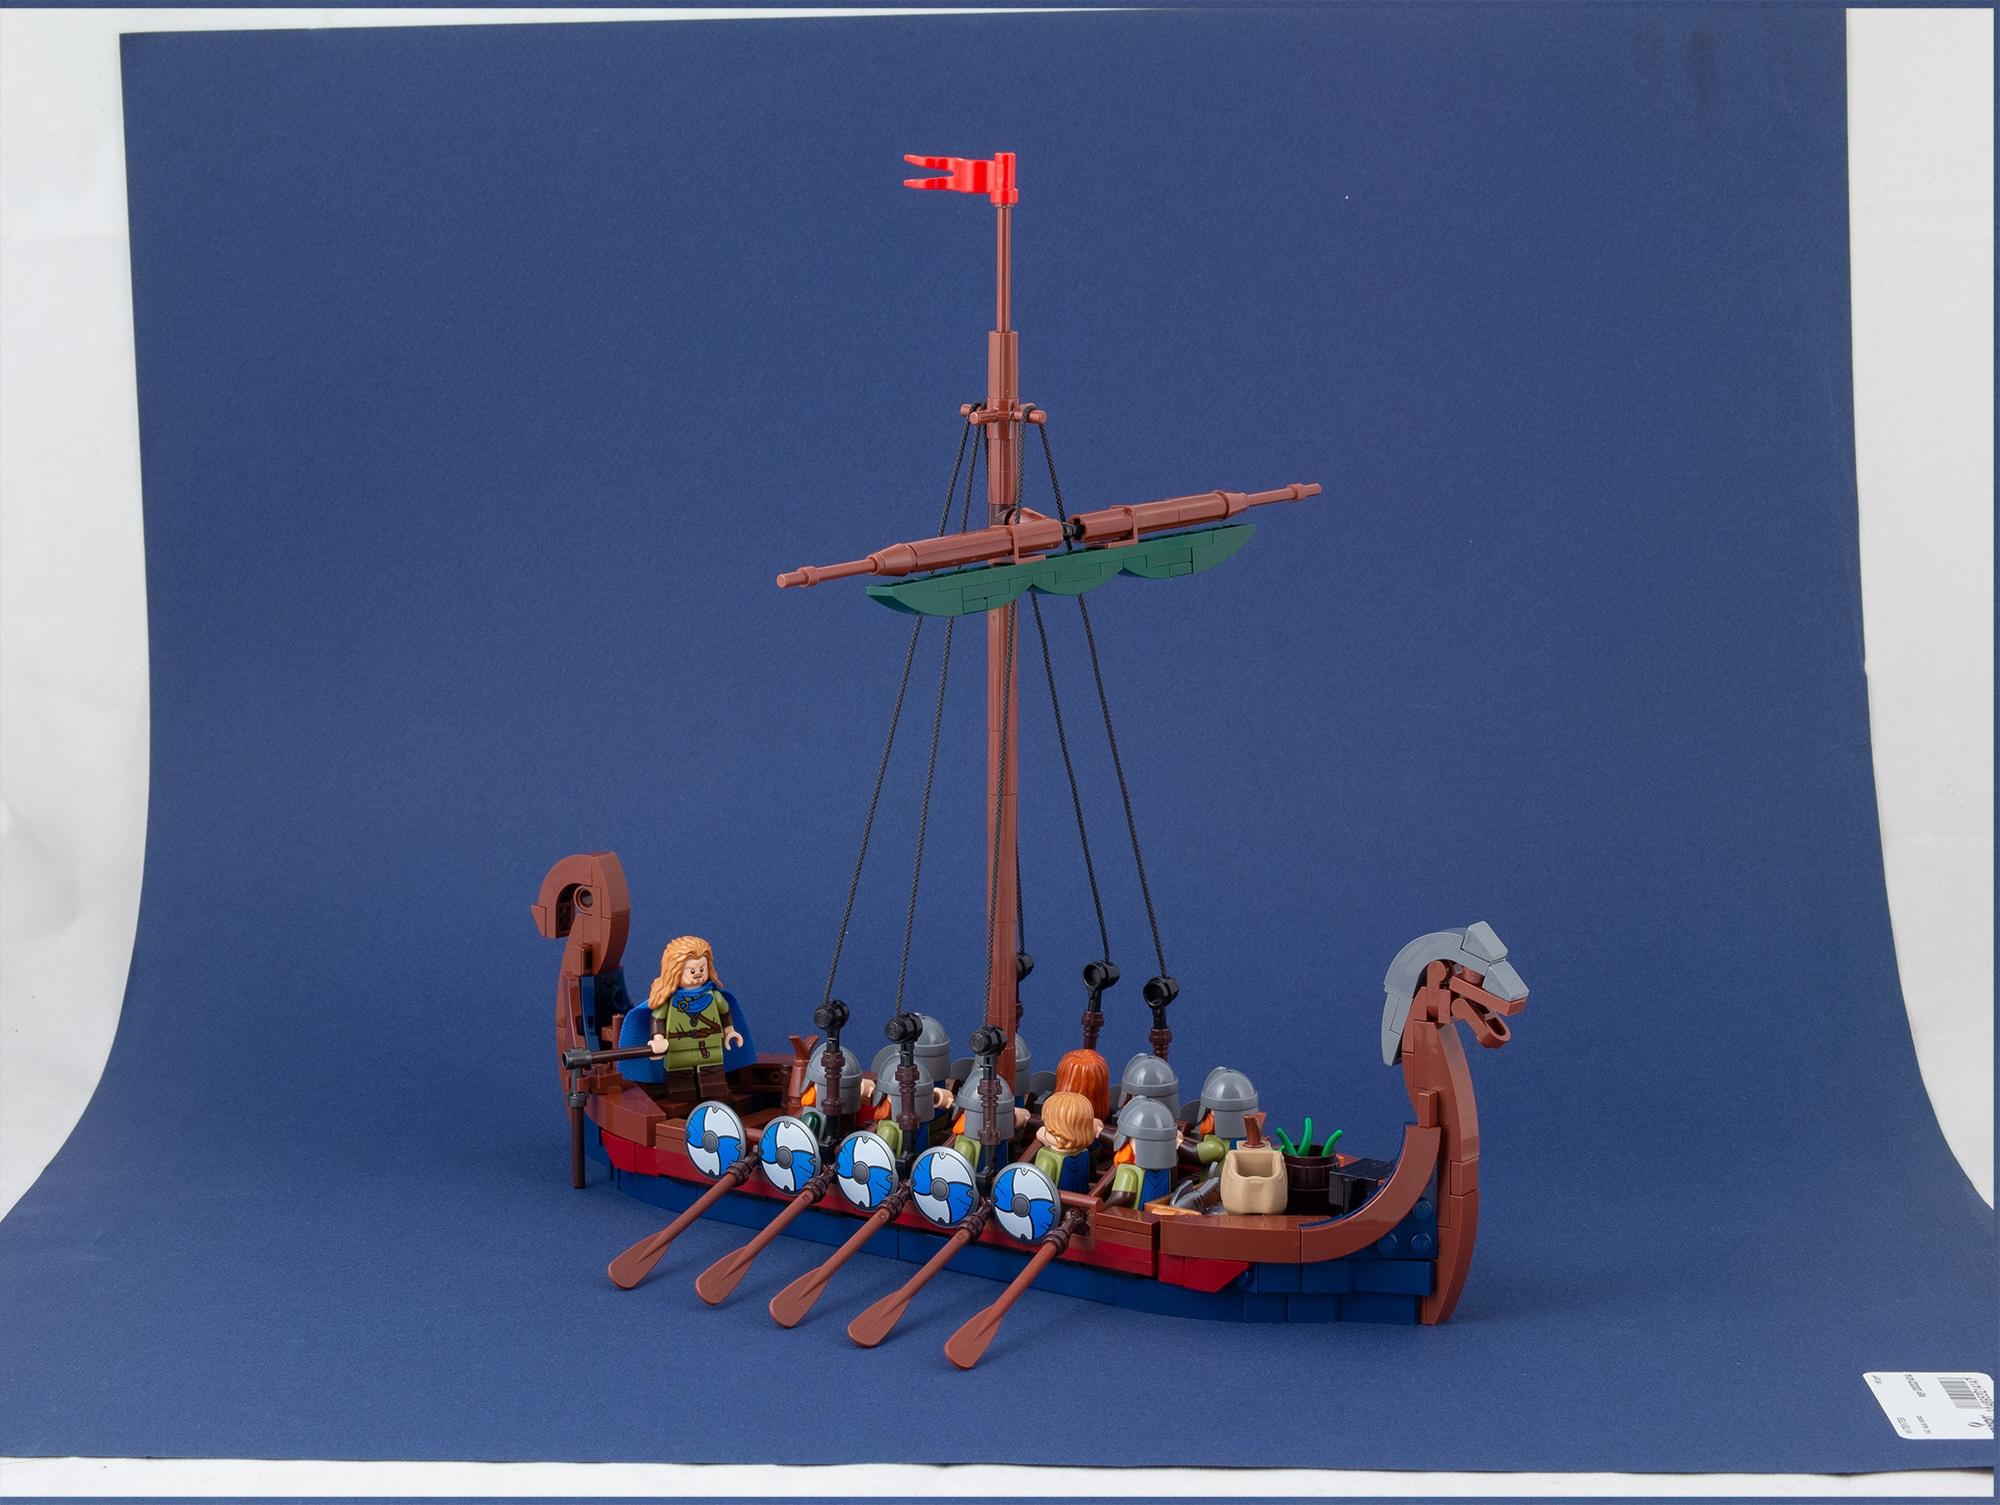 Vikingship Vergleich 02